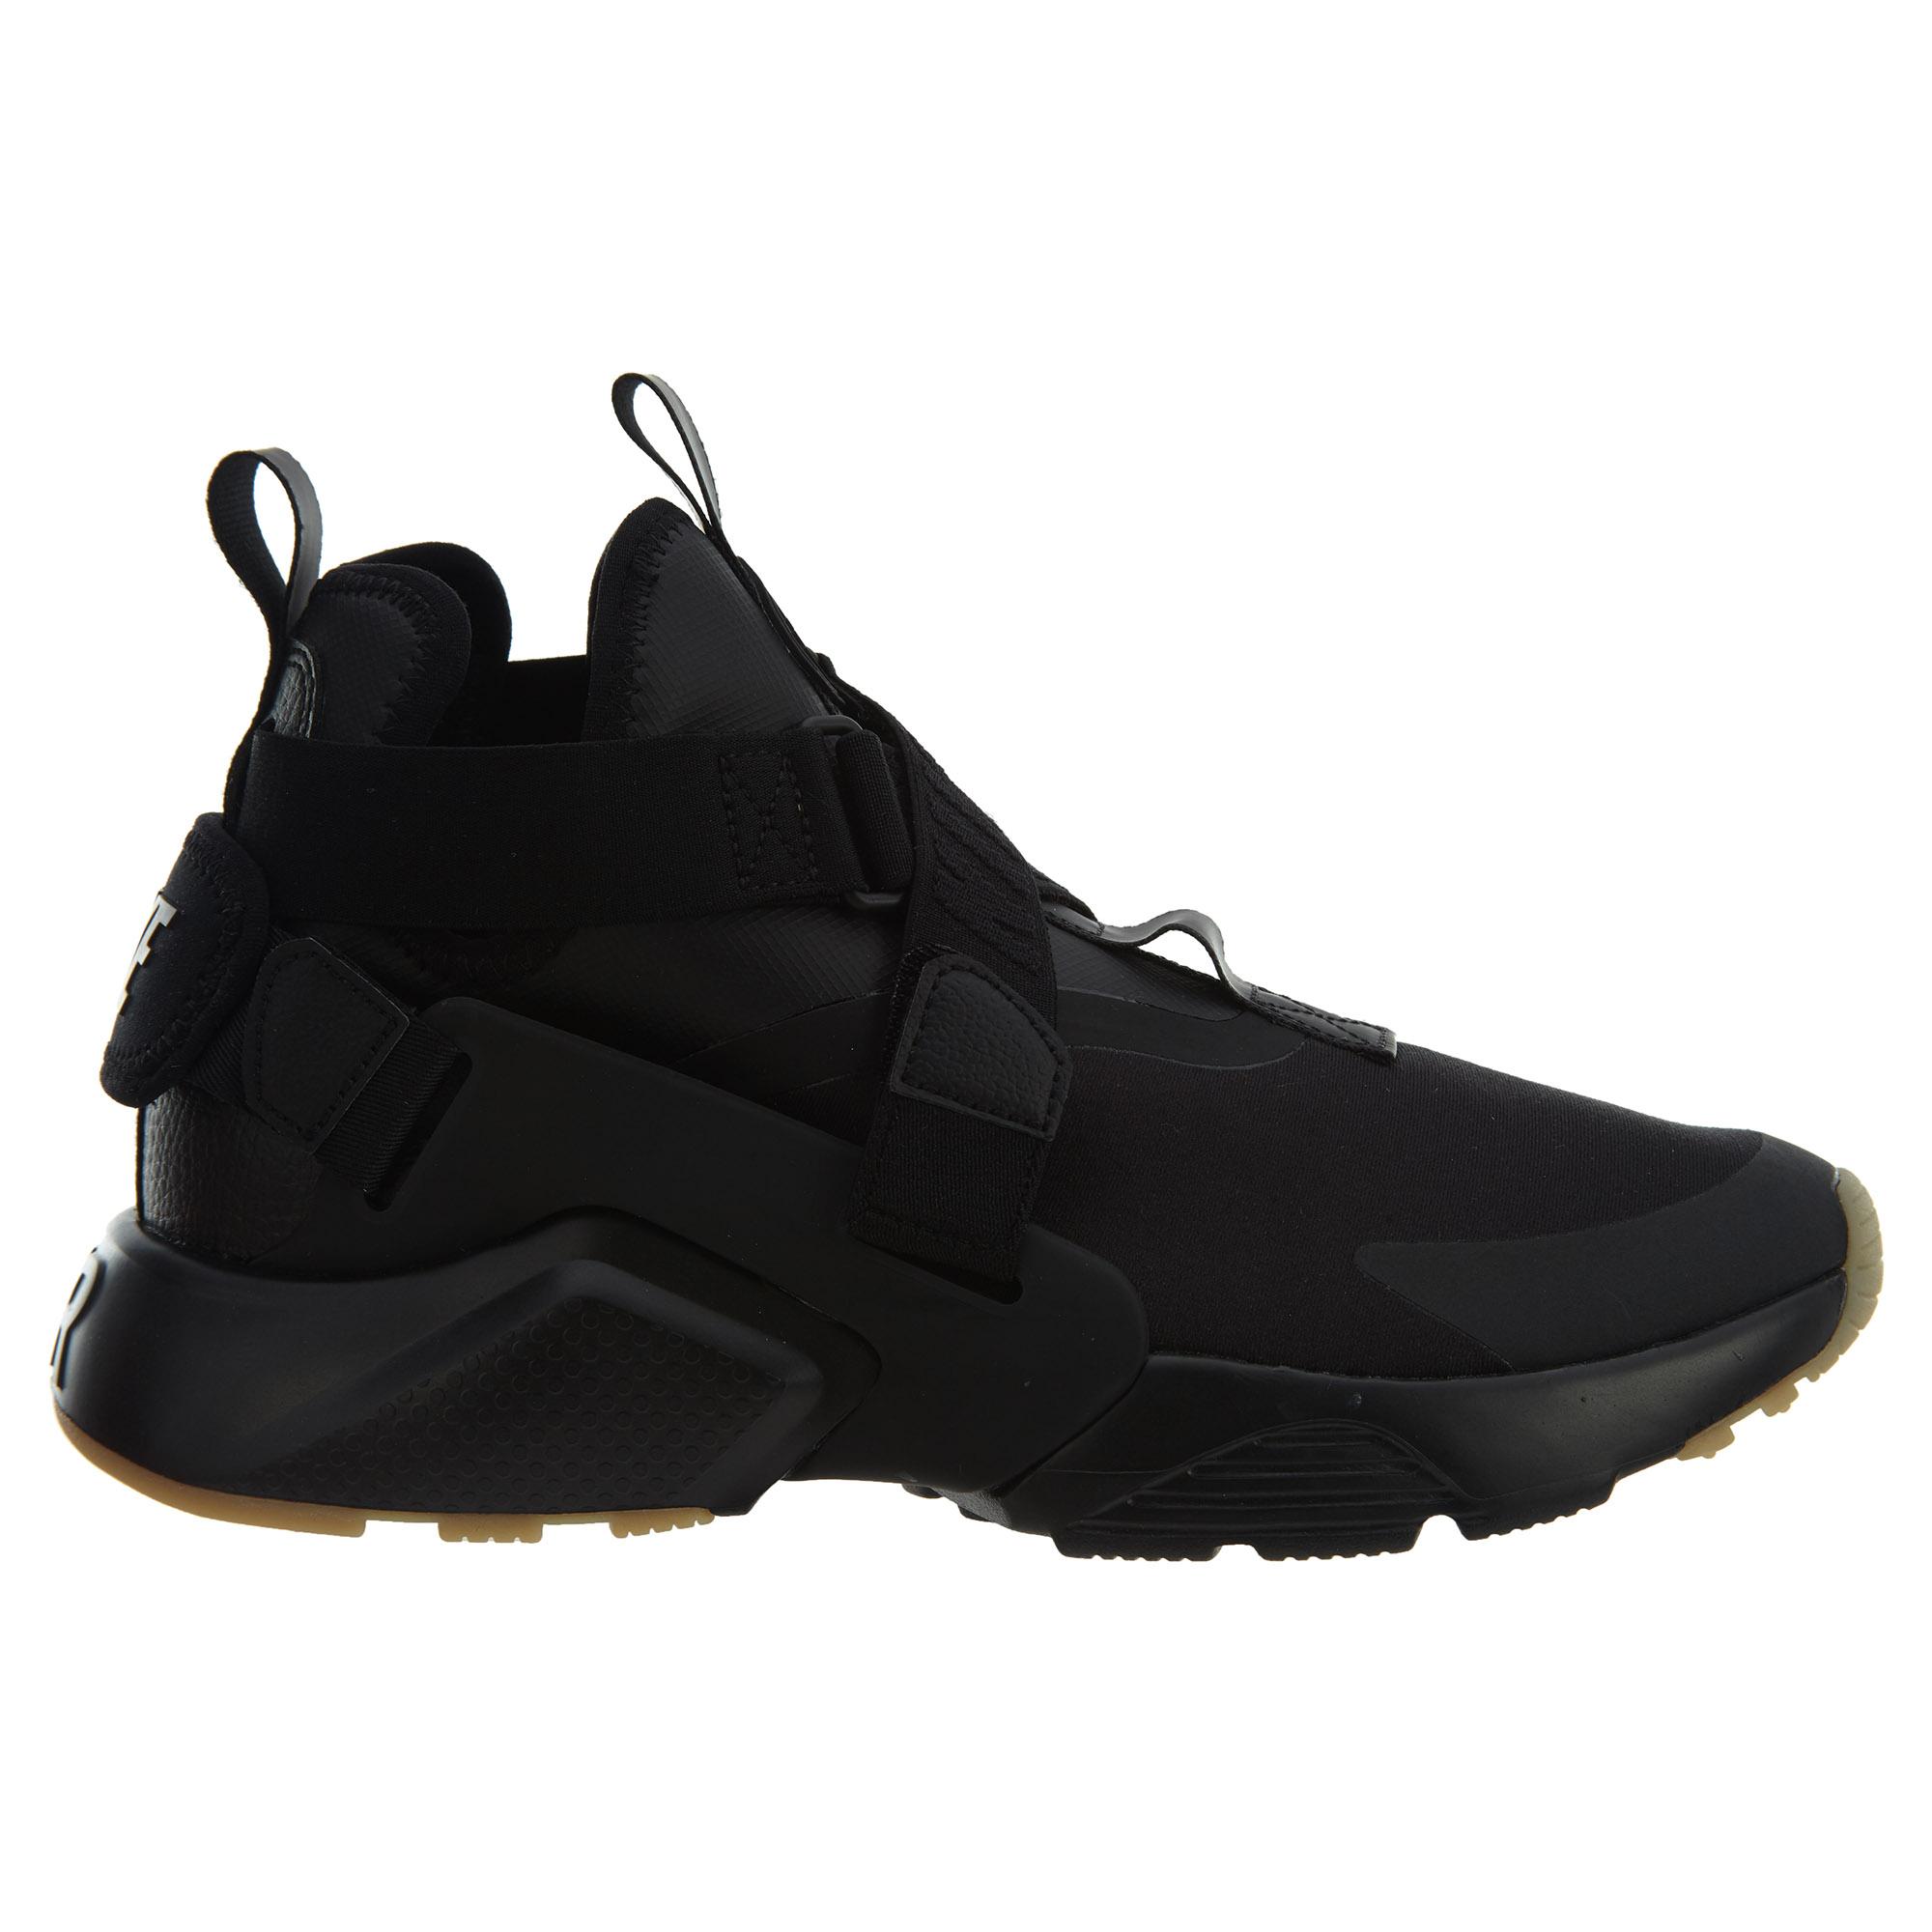 Nike Air Huarache City Black Black-Dark Grey (W) - AH6787-003